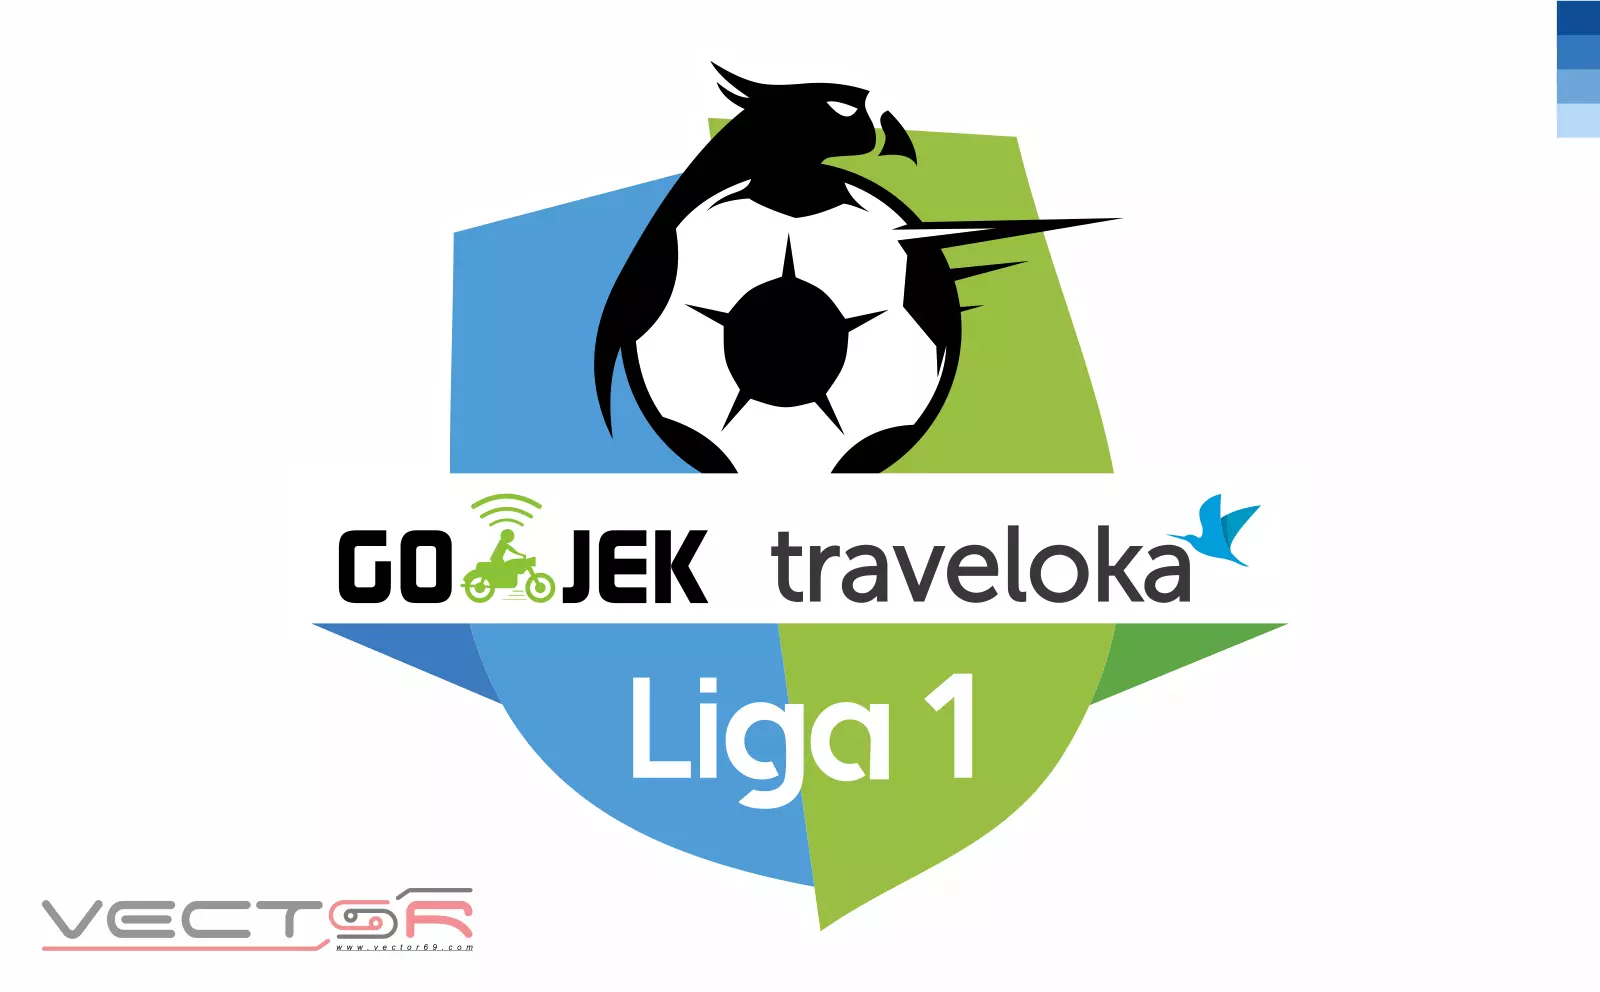 Gojek Traveloka Liga 1 Indonesia Logo - Download Vector File Encapsulated PostScript (.EPS)